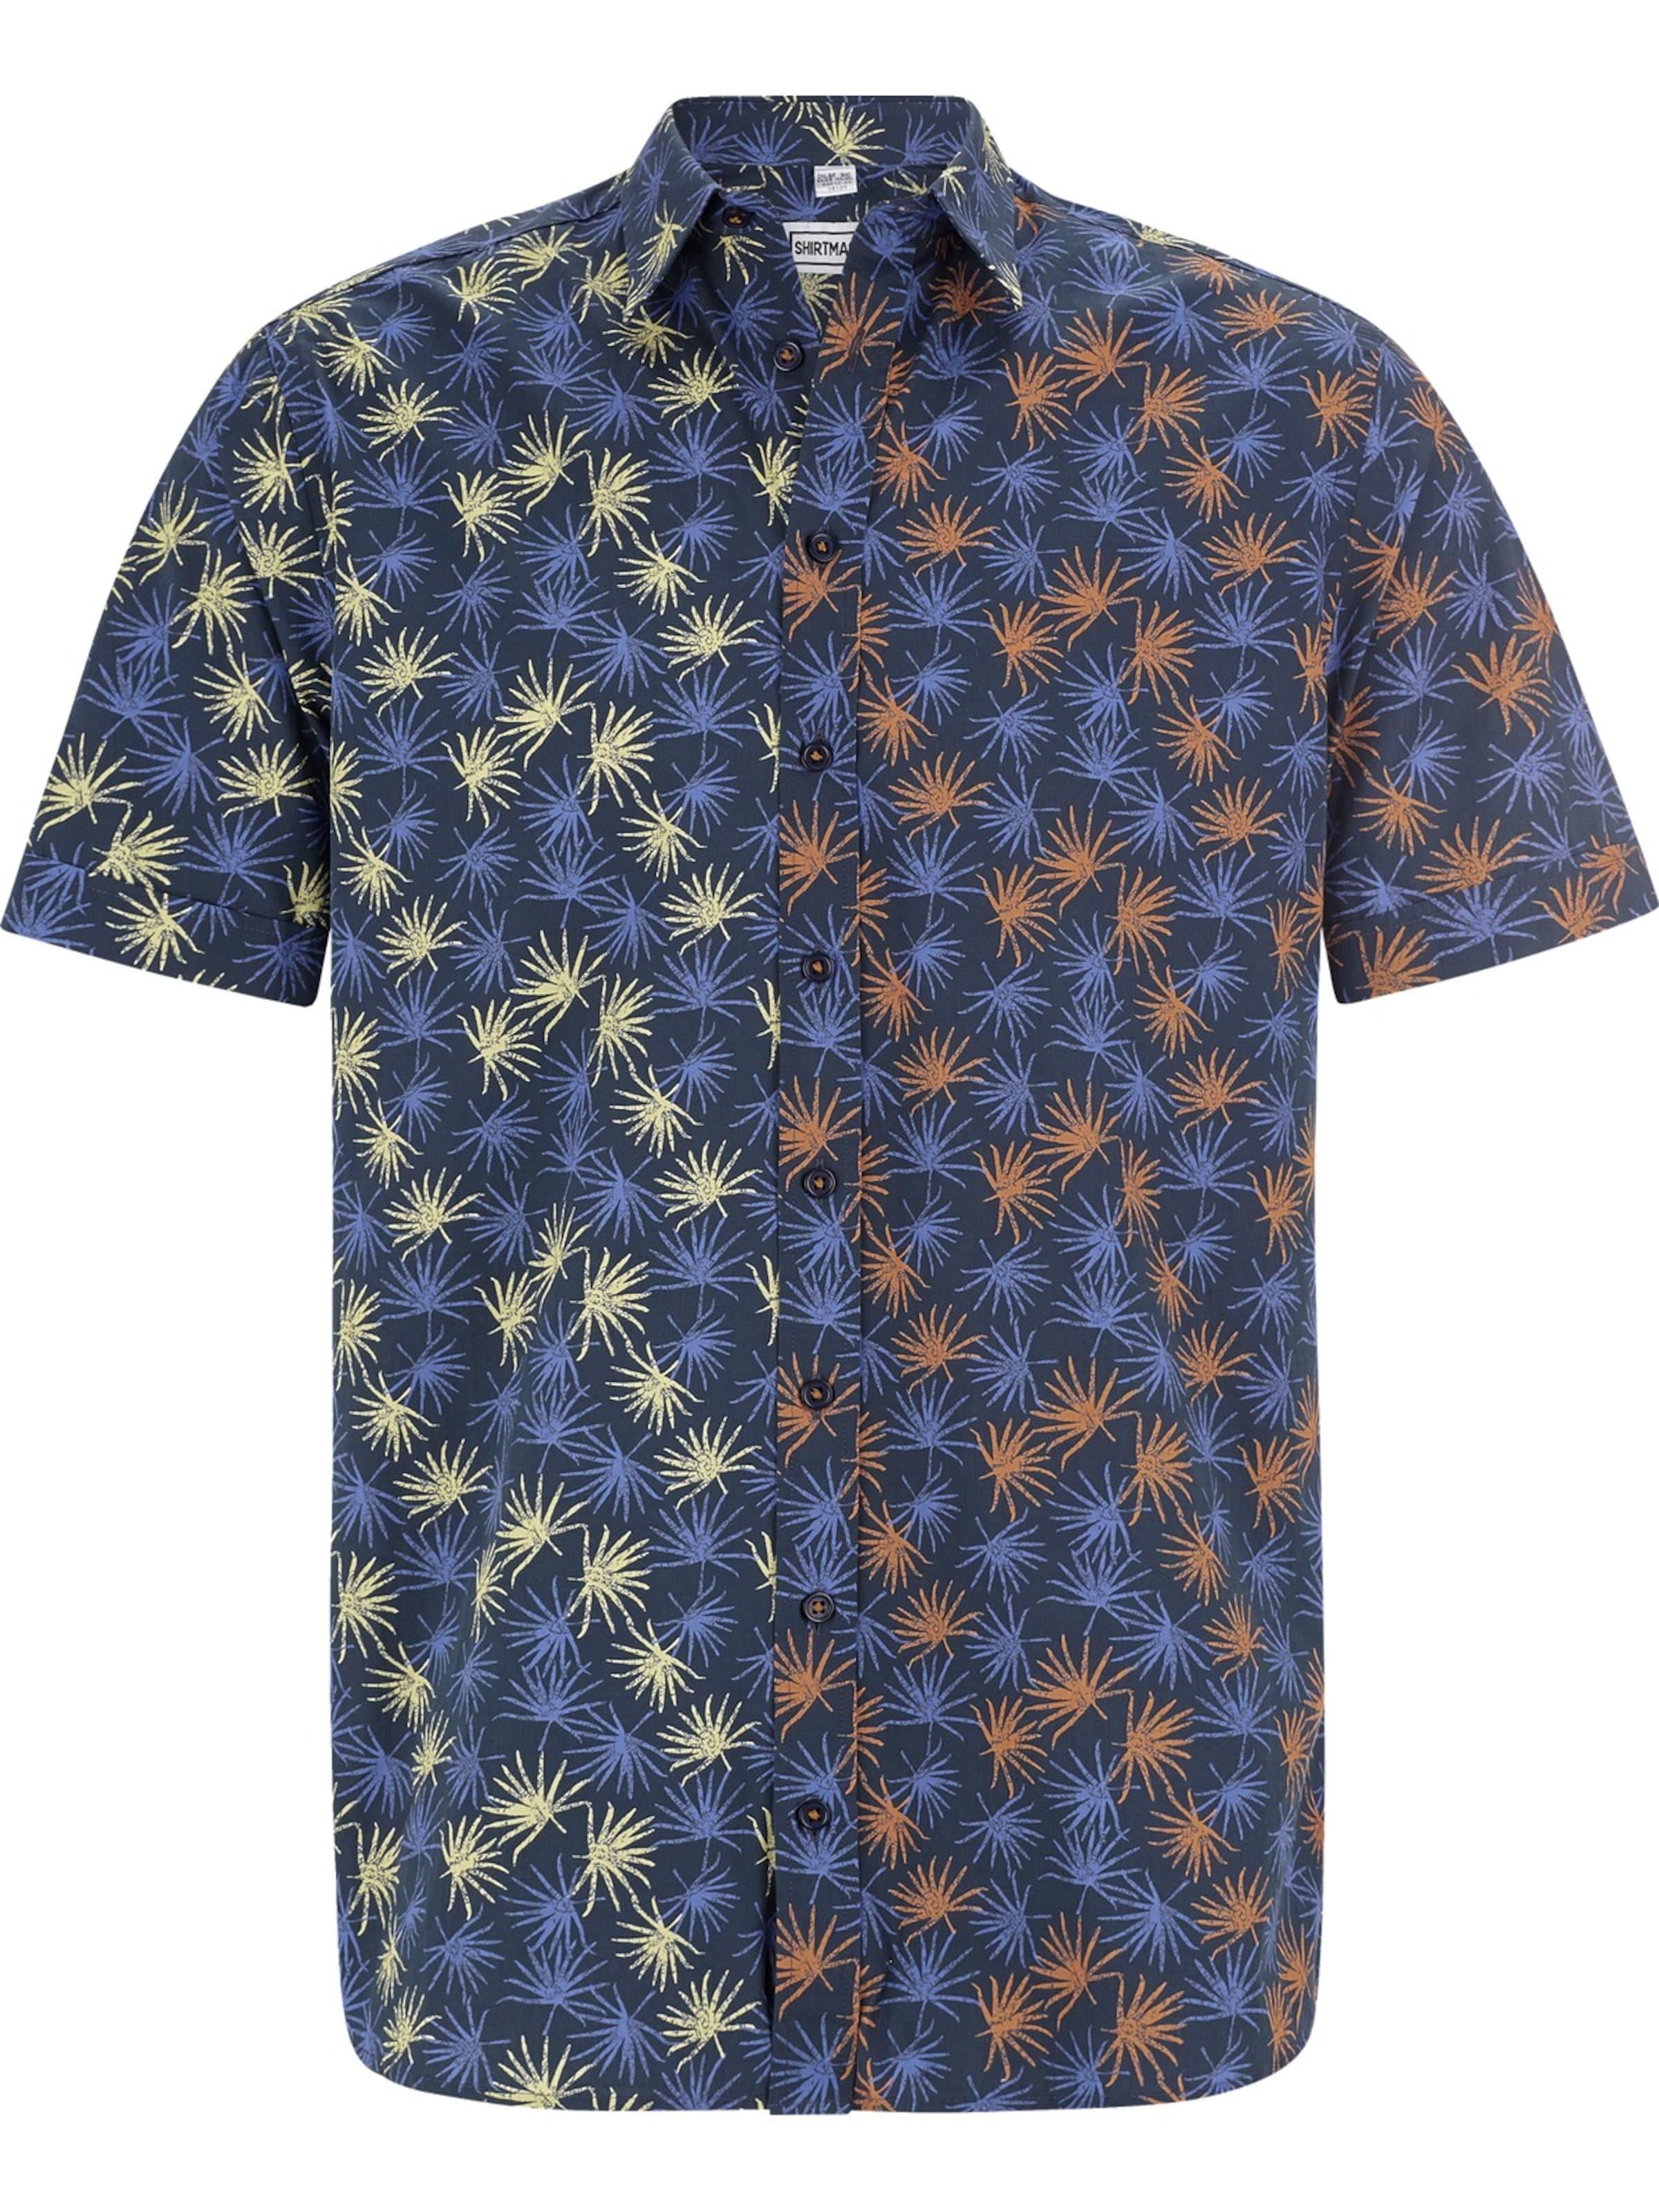 In Hemd 'escapefromwinter' Shirtmaster Hemd 'escapefromwinter' In DunkelblauMischfarben Shirtmaster DunkelblauMischfarben 76gbfy